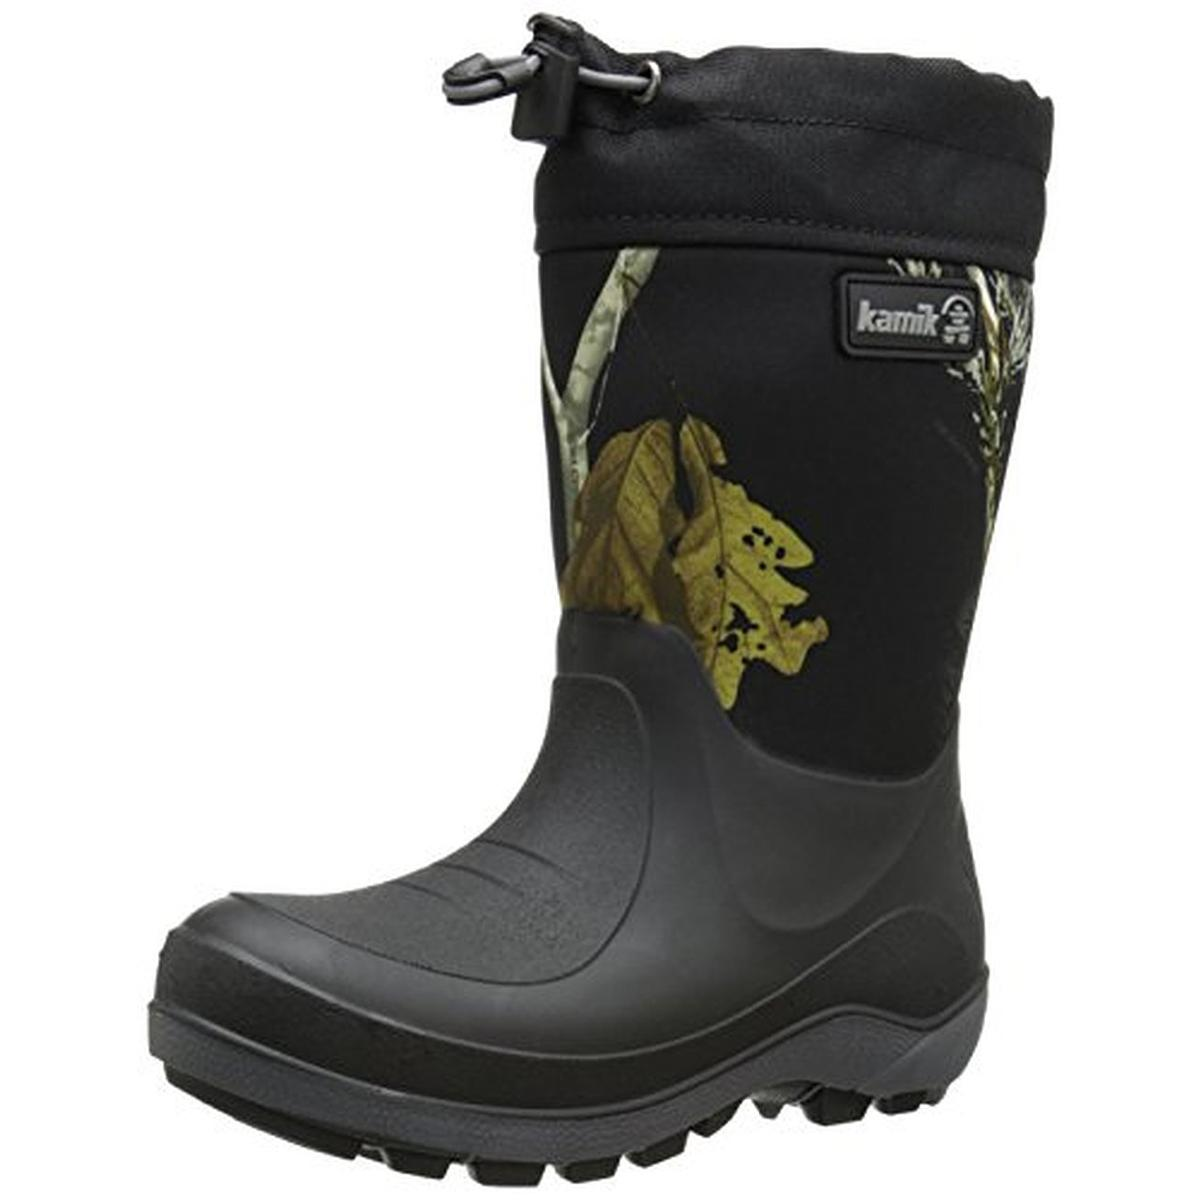 Boys Black Snow Boots